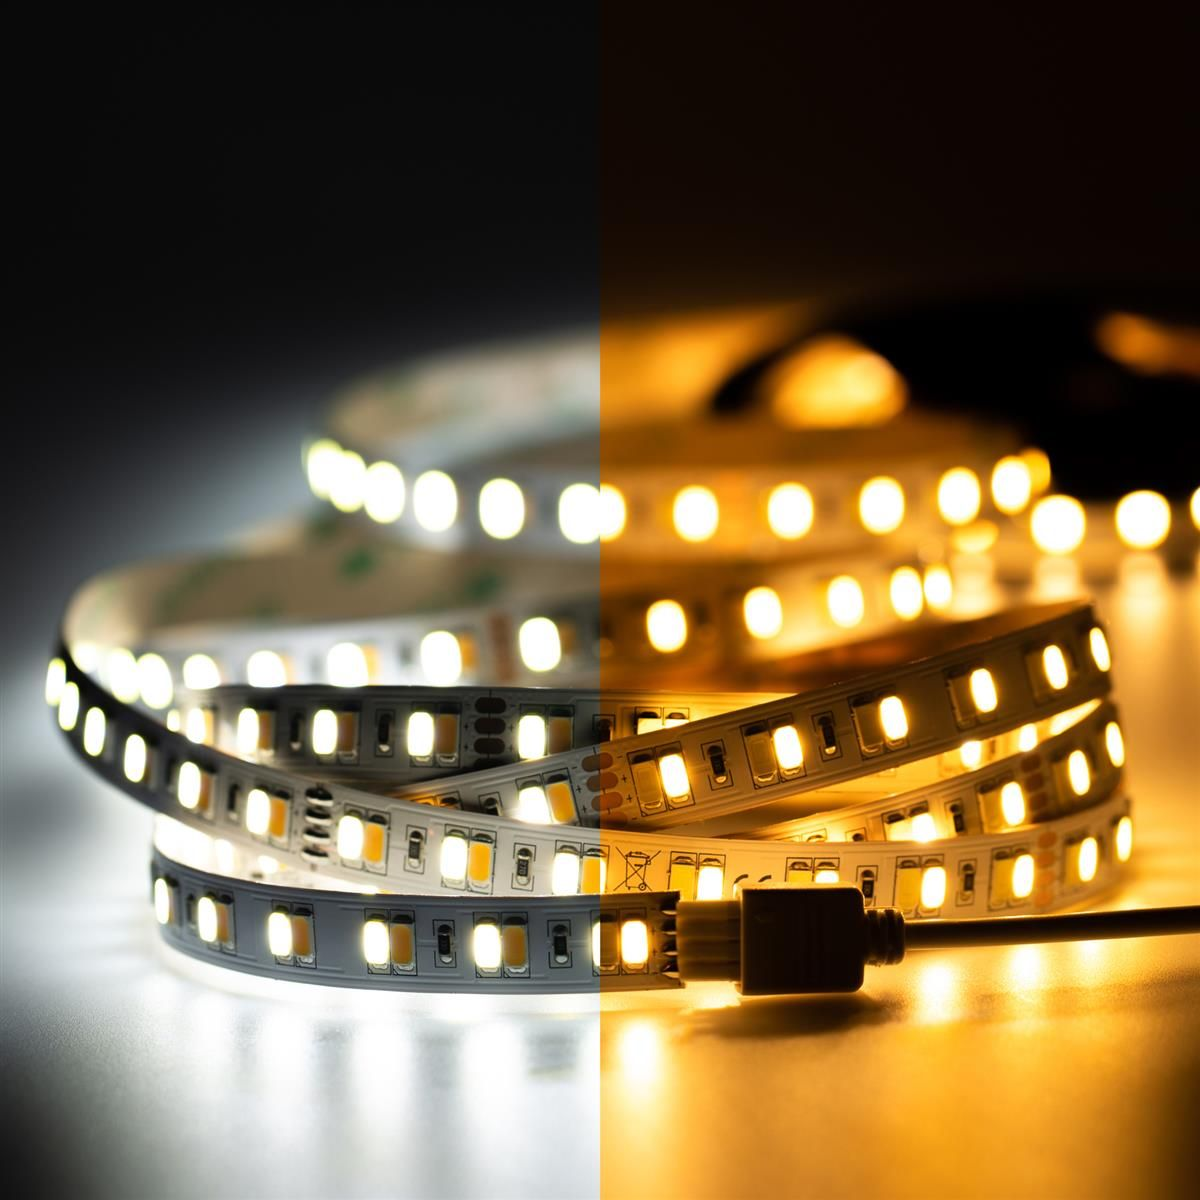 24V LED Streifen – Farbtemperatur einstellbar – 140 LEDs je Meter – alle 10cm teilbar